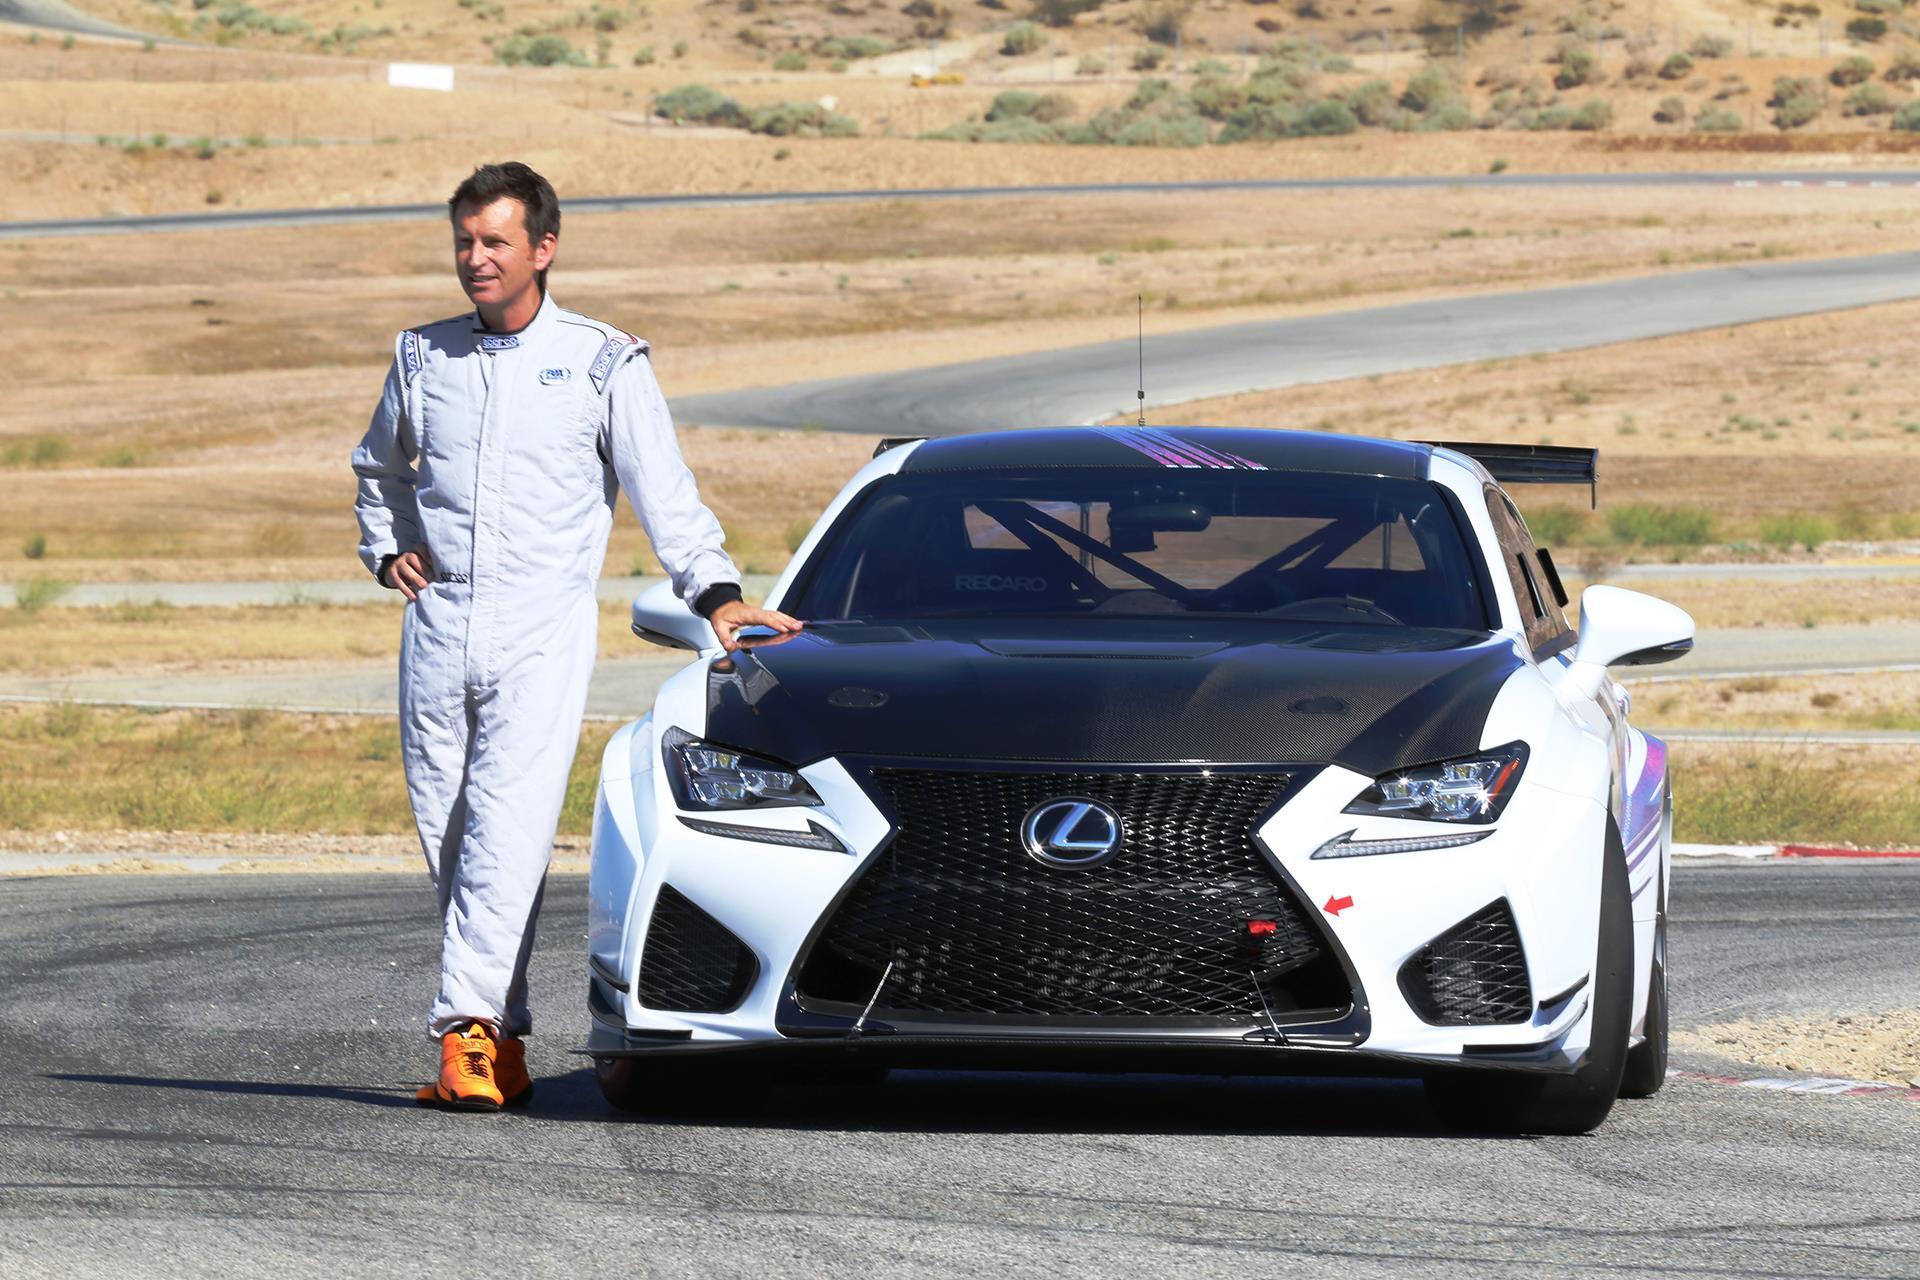 2015 Lexus RC F GT Concept